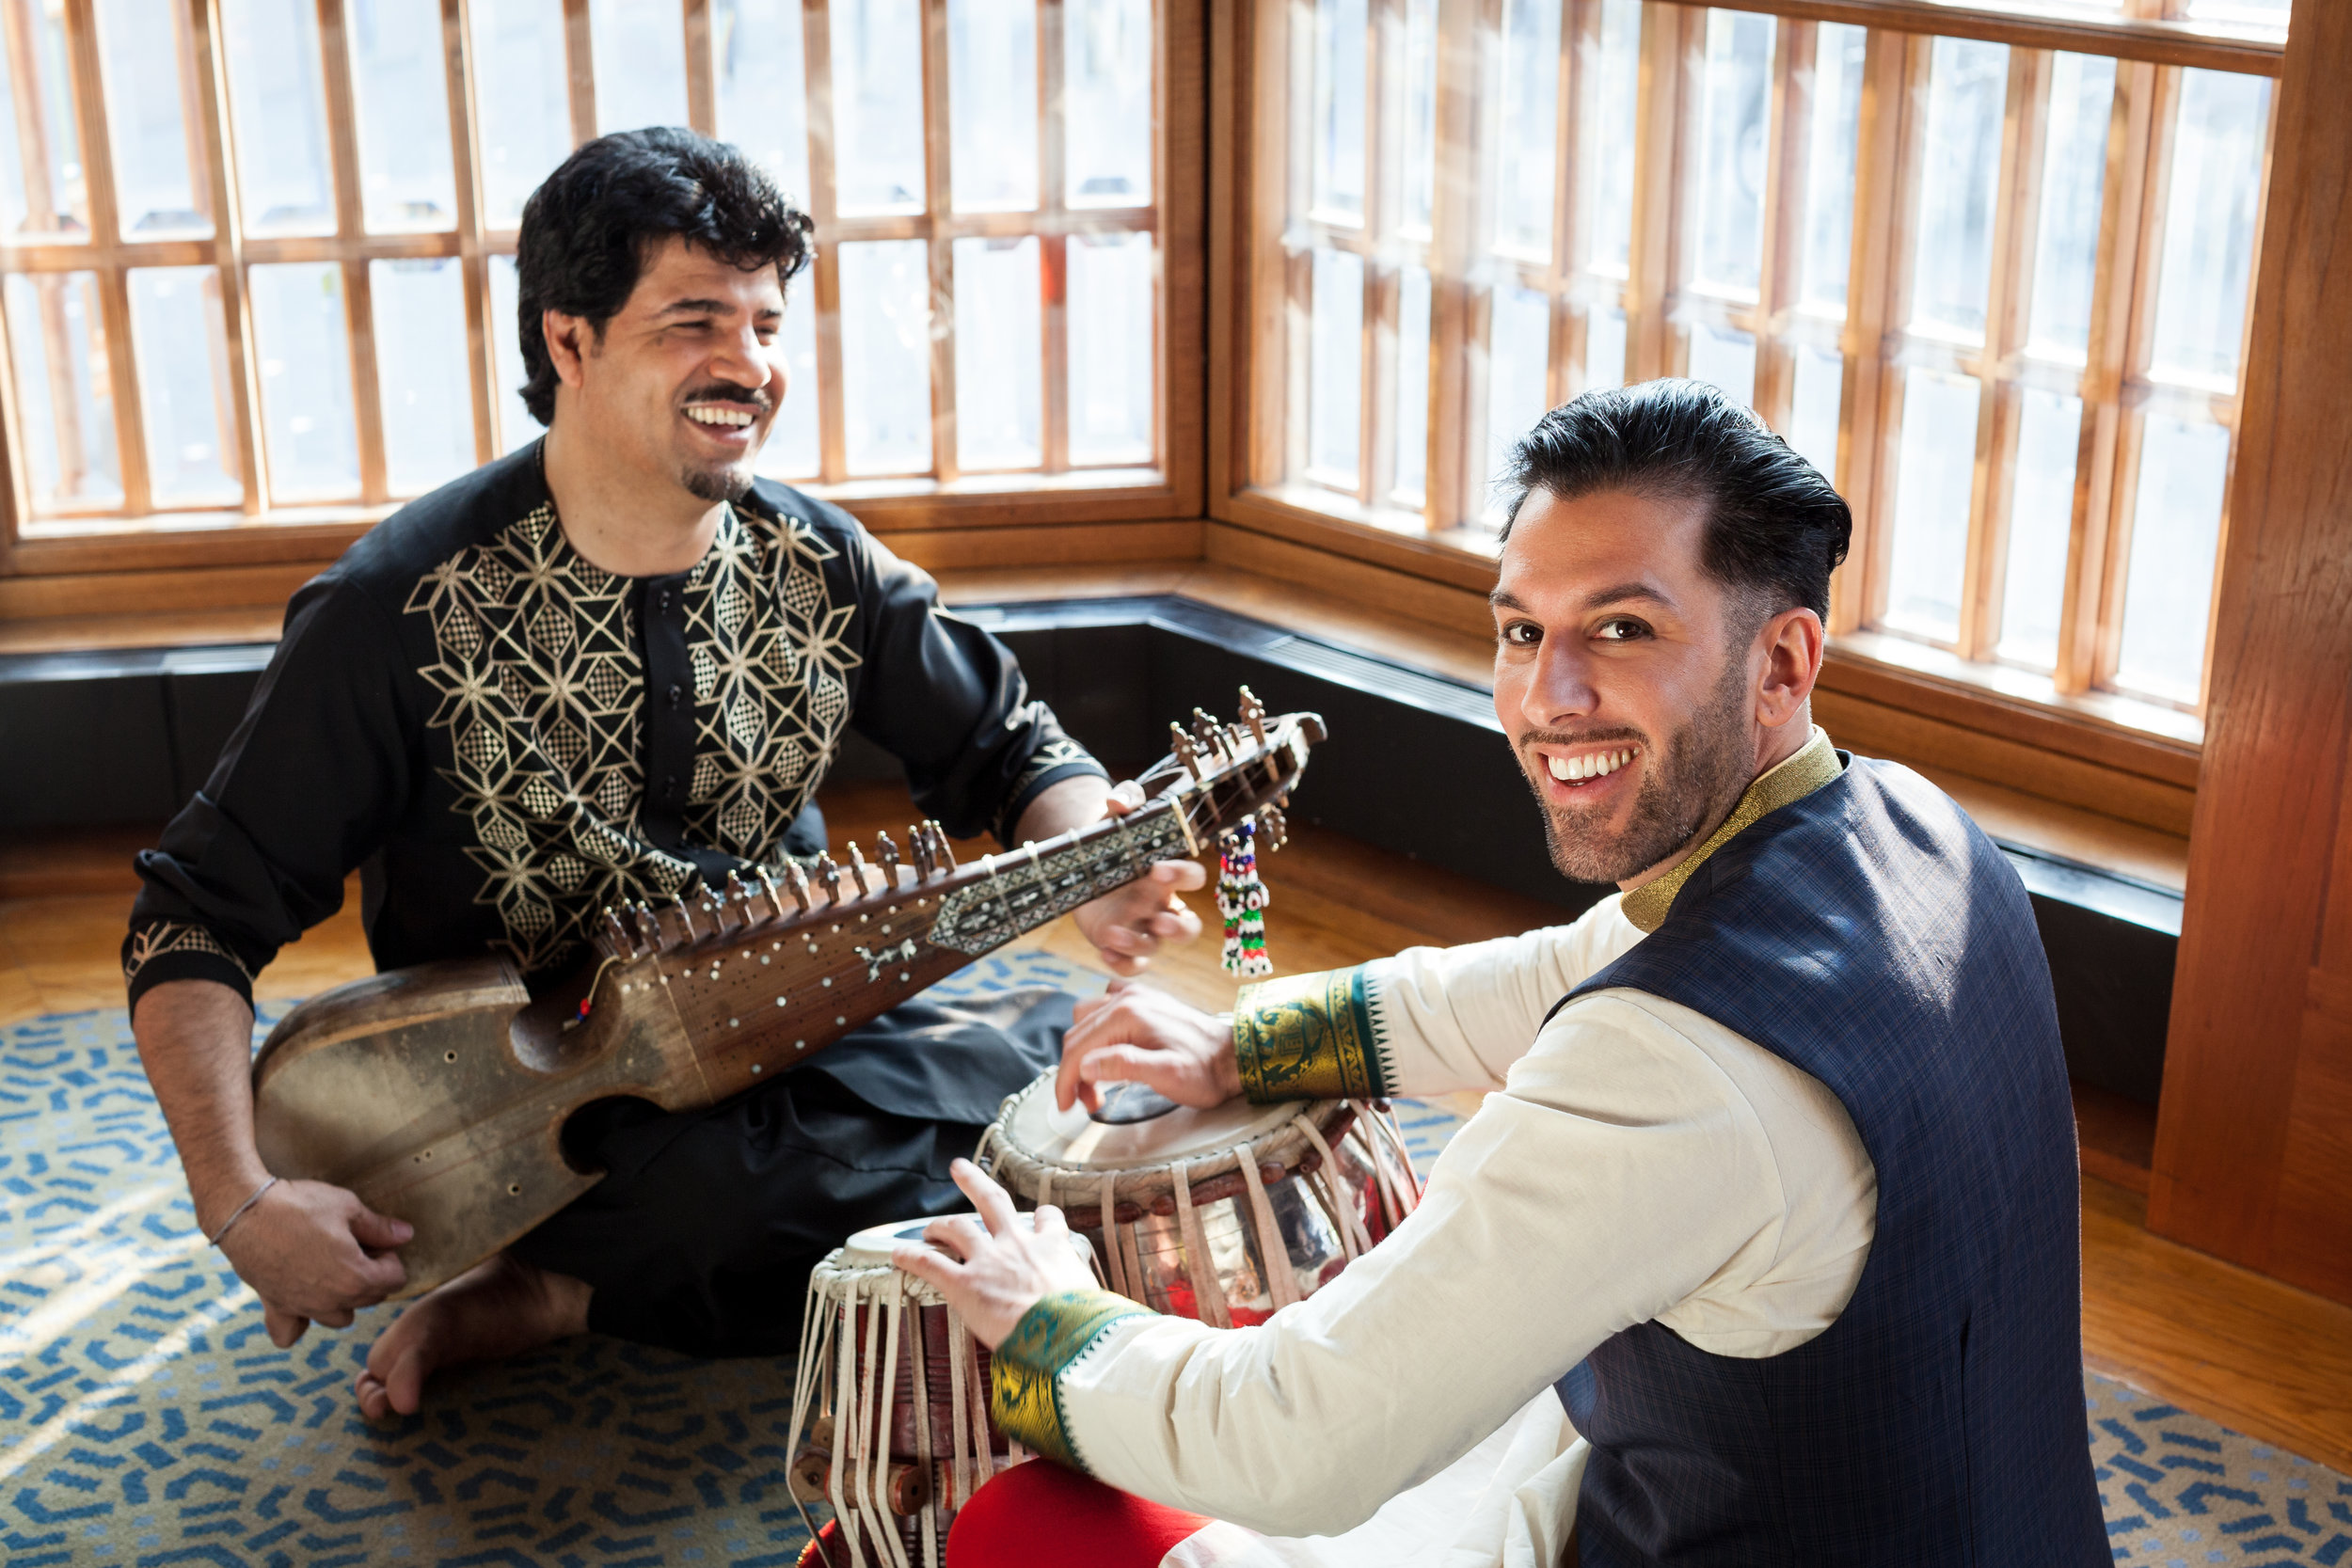 Homayoun-Sakhi-&-Salar-Nader_-Photo-by-Sebastian-Schutyser_Aga-Khan-Music-Initiative.jpg